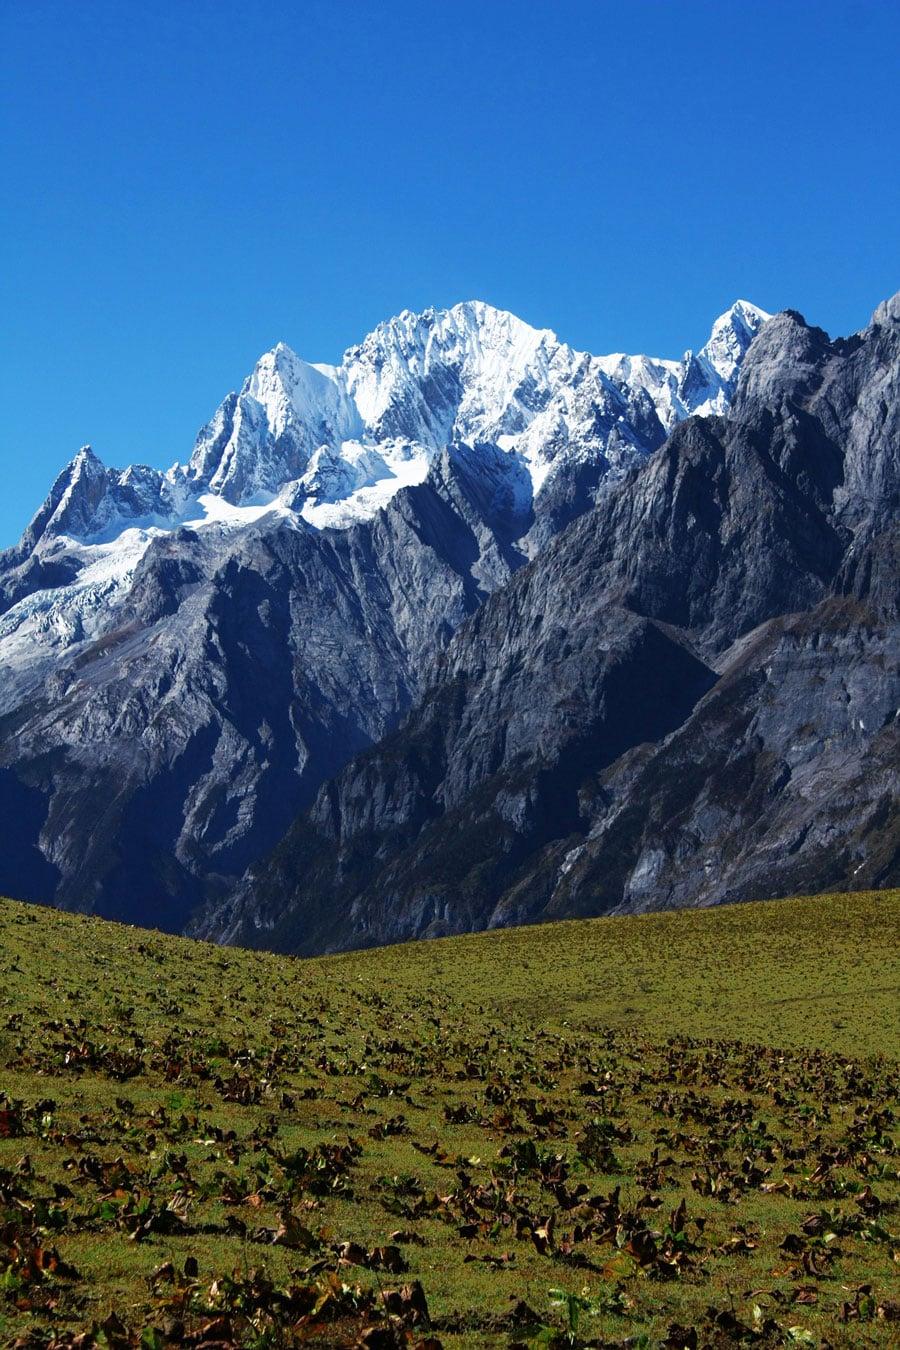 The Jade Dragon Snow Mountain in Lijiang